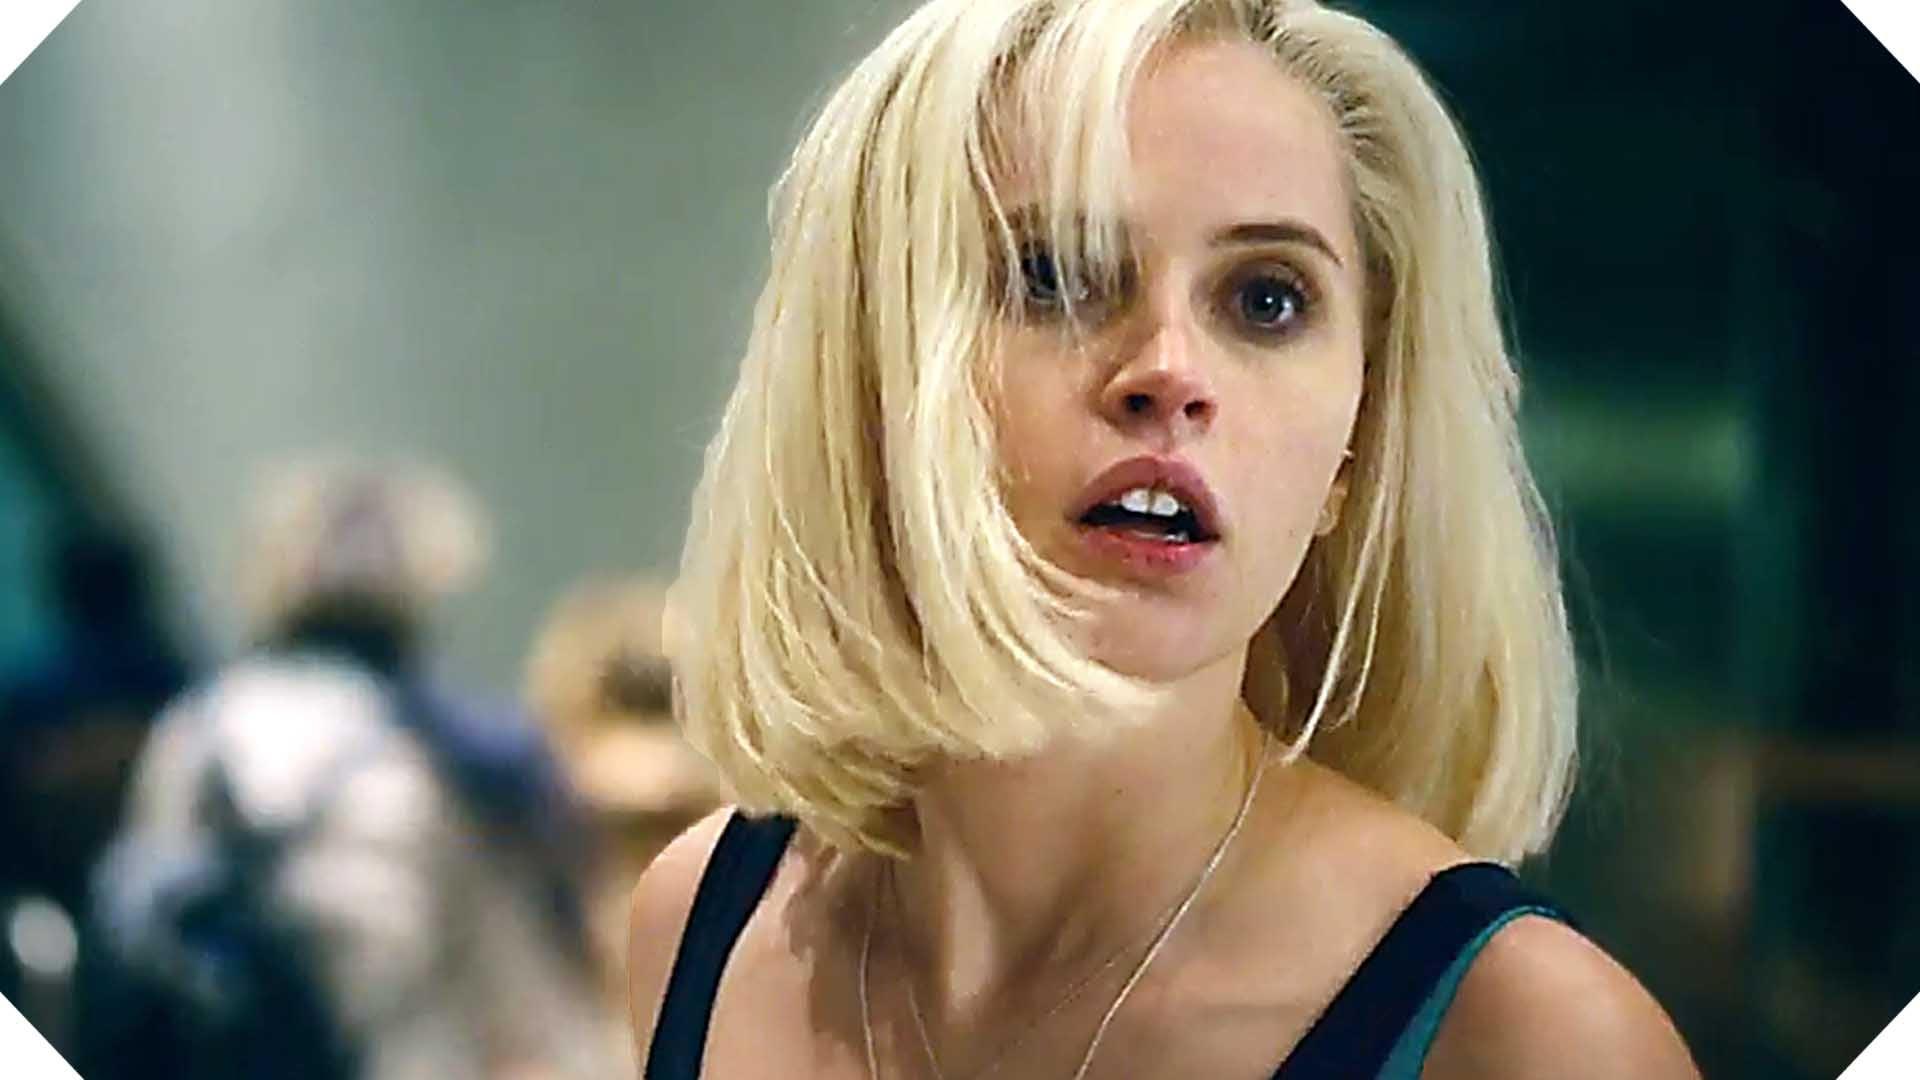 COLLIDE Movie TRAILER (Felicity Jones - Action Thriller, 2016)